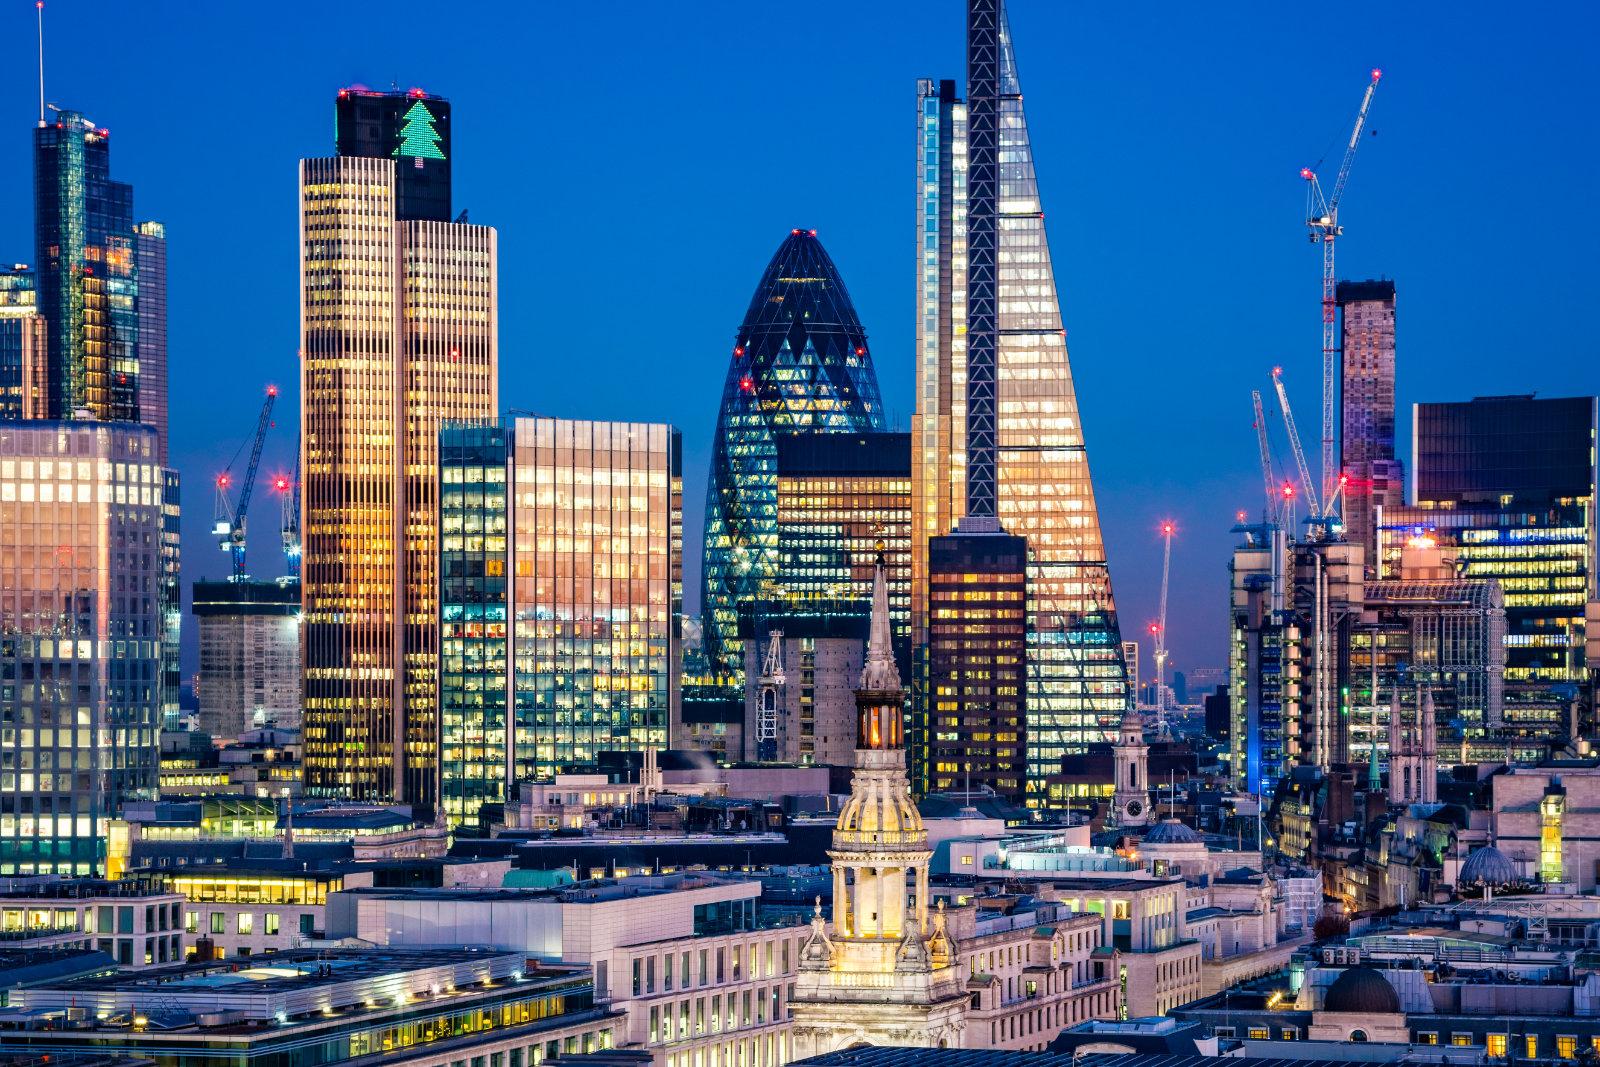 iStock 637936524 1 - Development Capital Solutions Launch